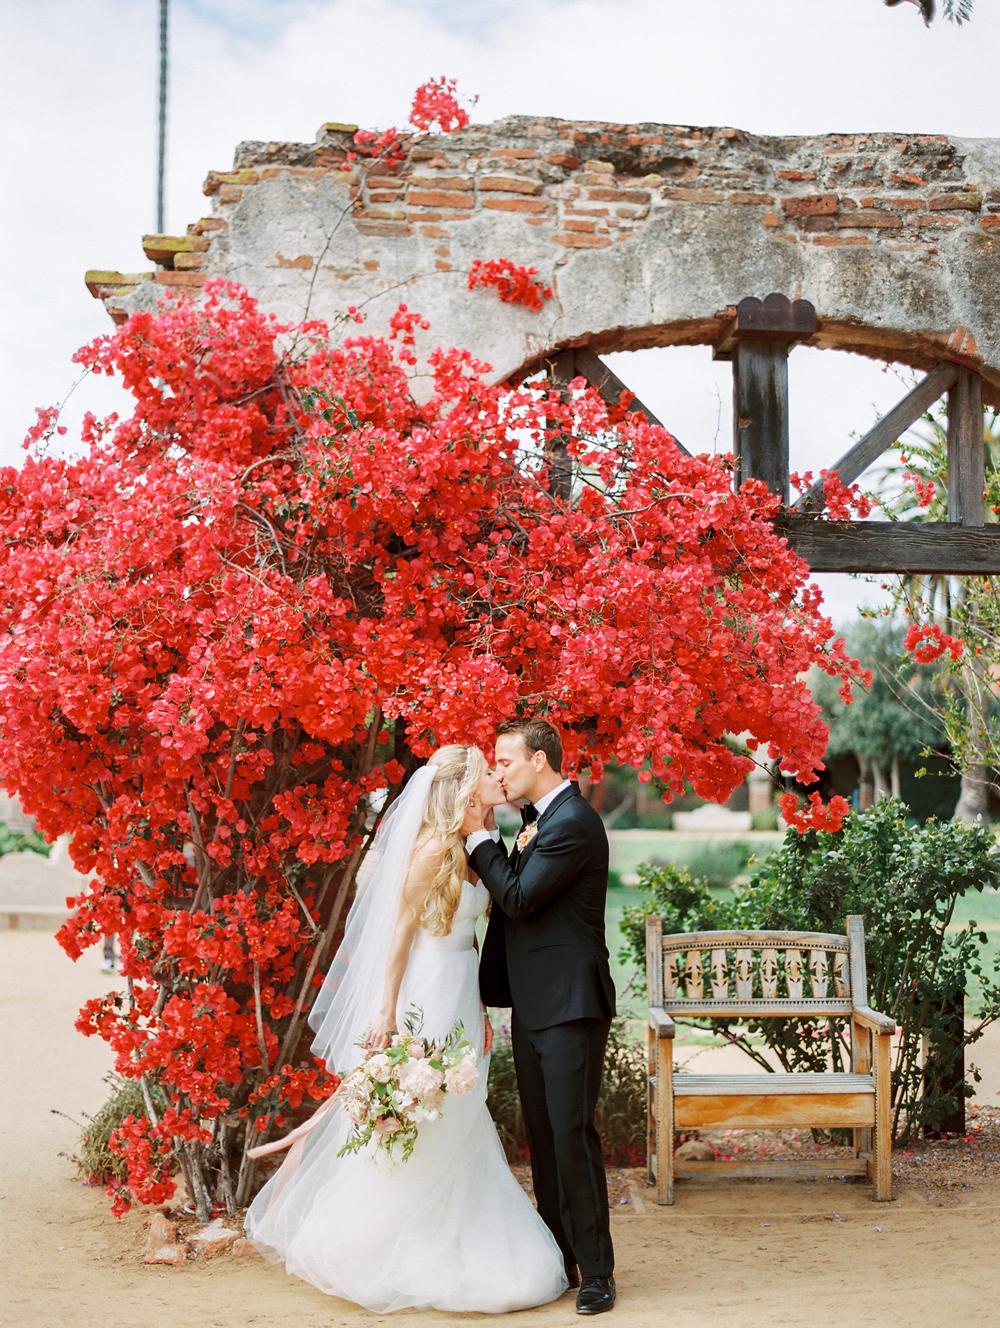 Cherry and Blush wedding color scheme